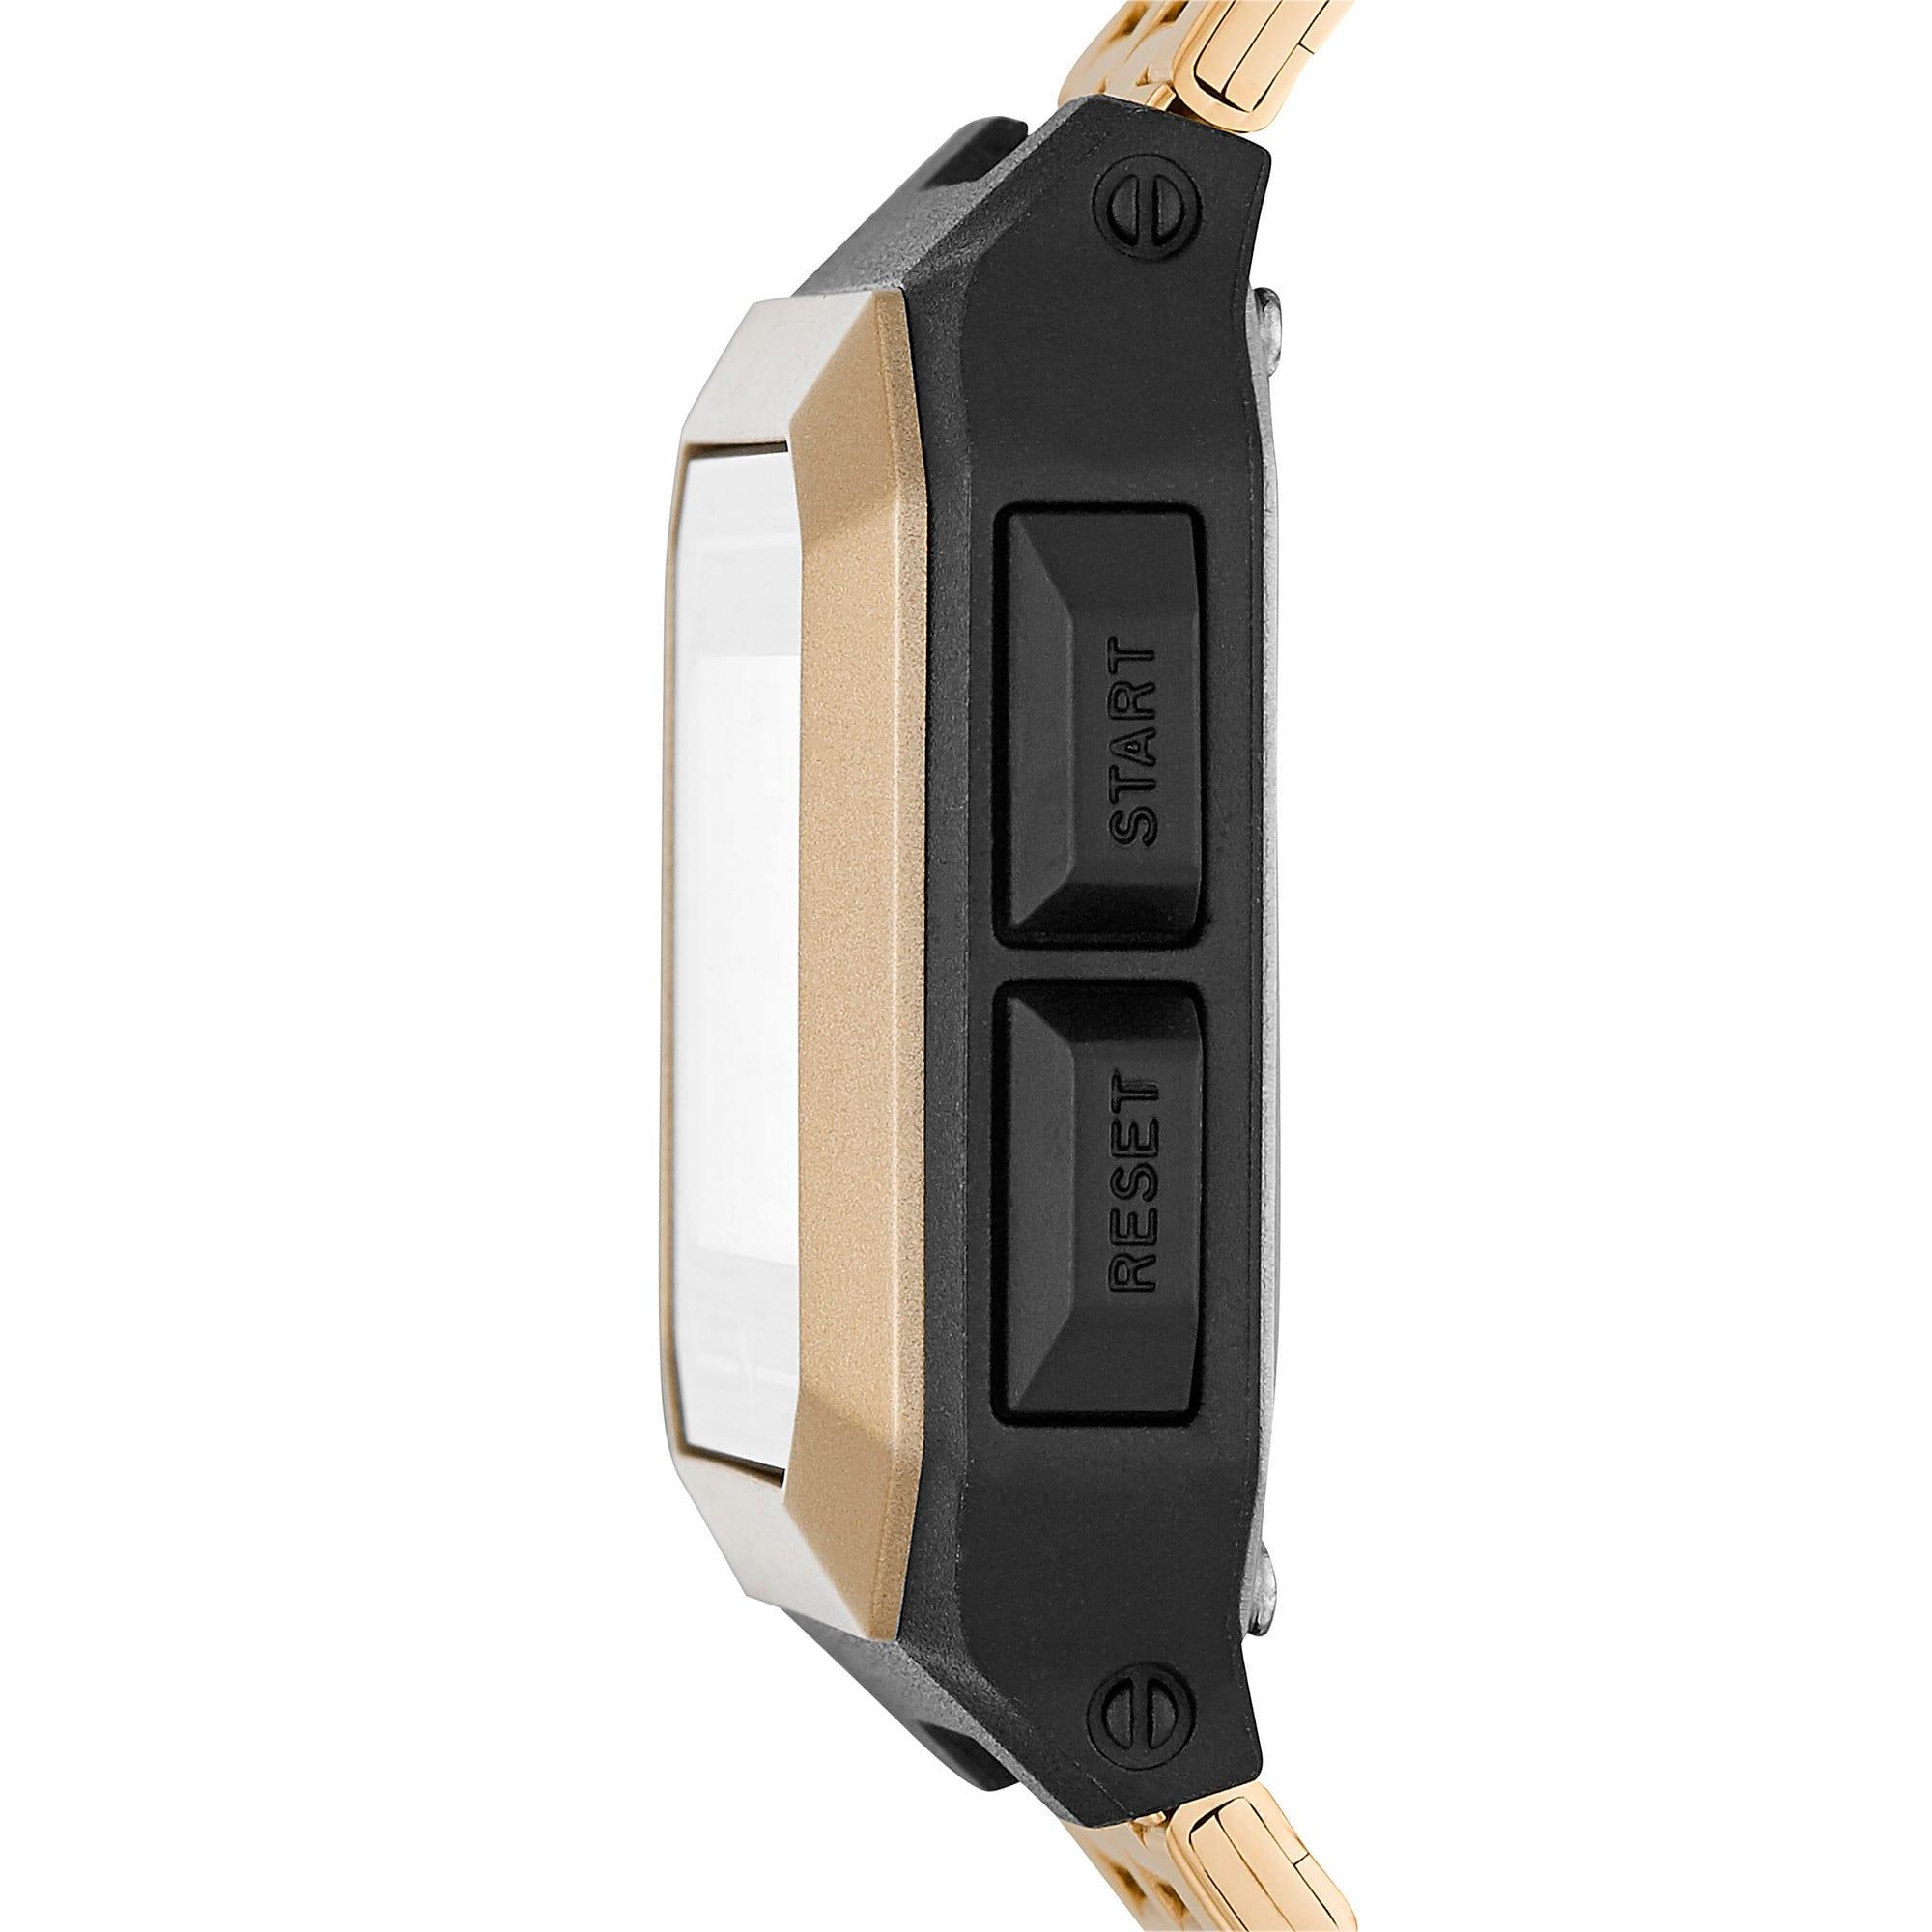 Thumbnail 3 of Remix Gold Stainless Steel Digital Watch, Gold/Black, medium